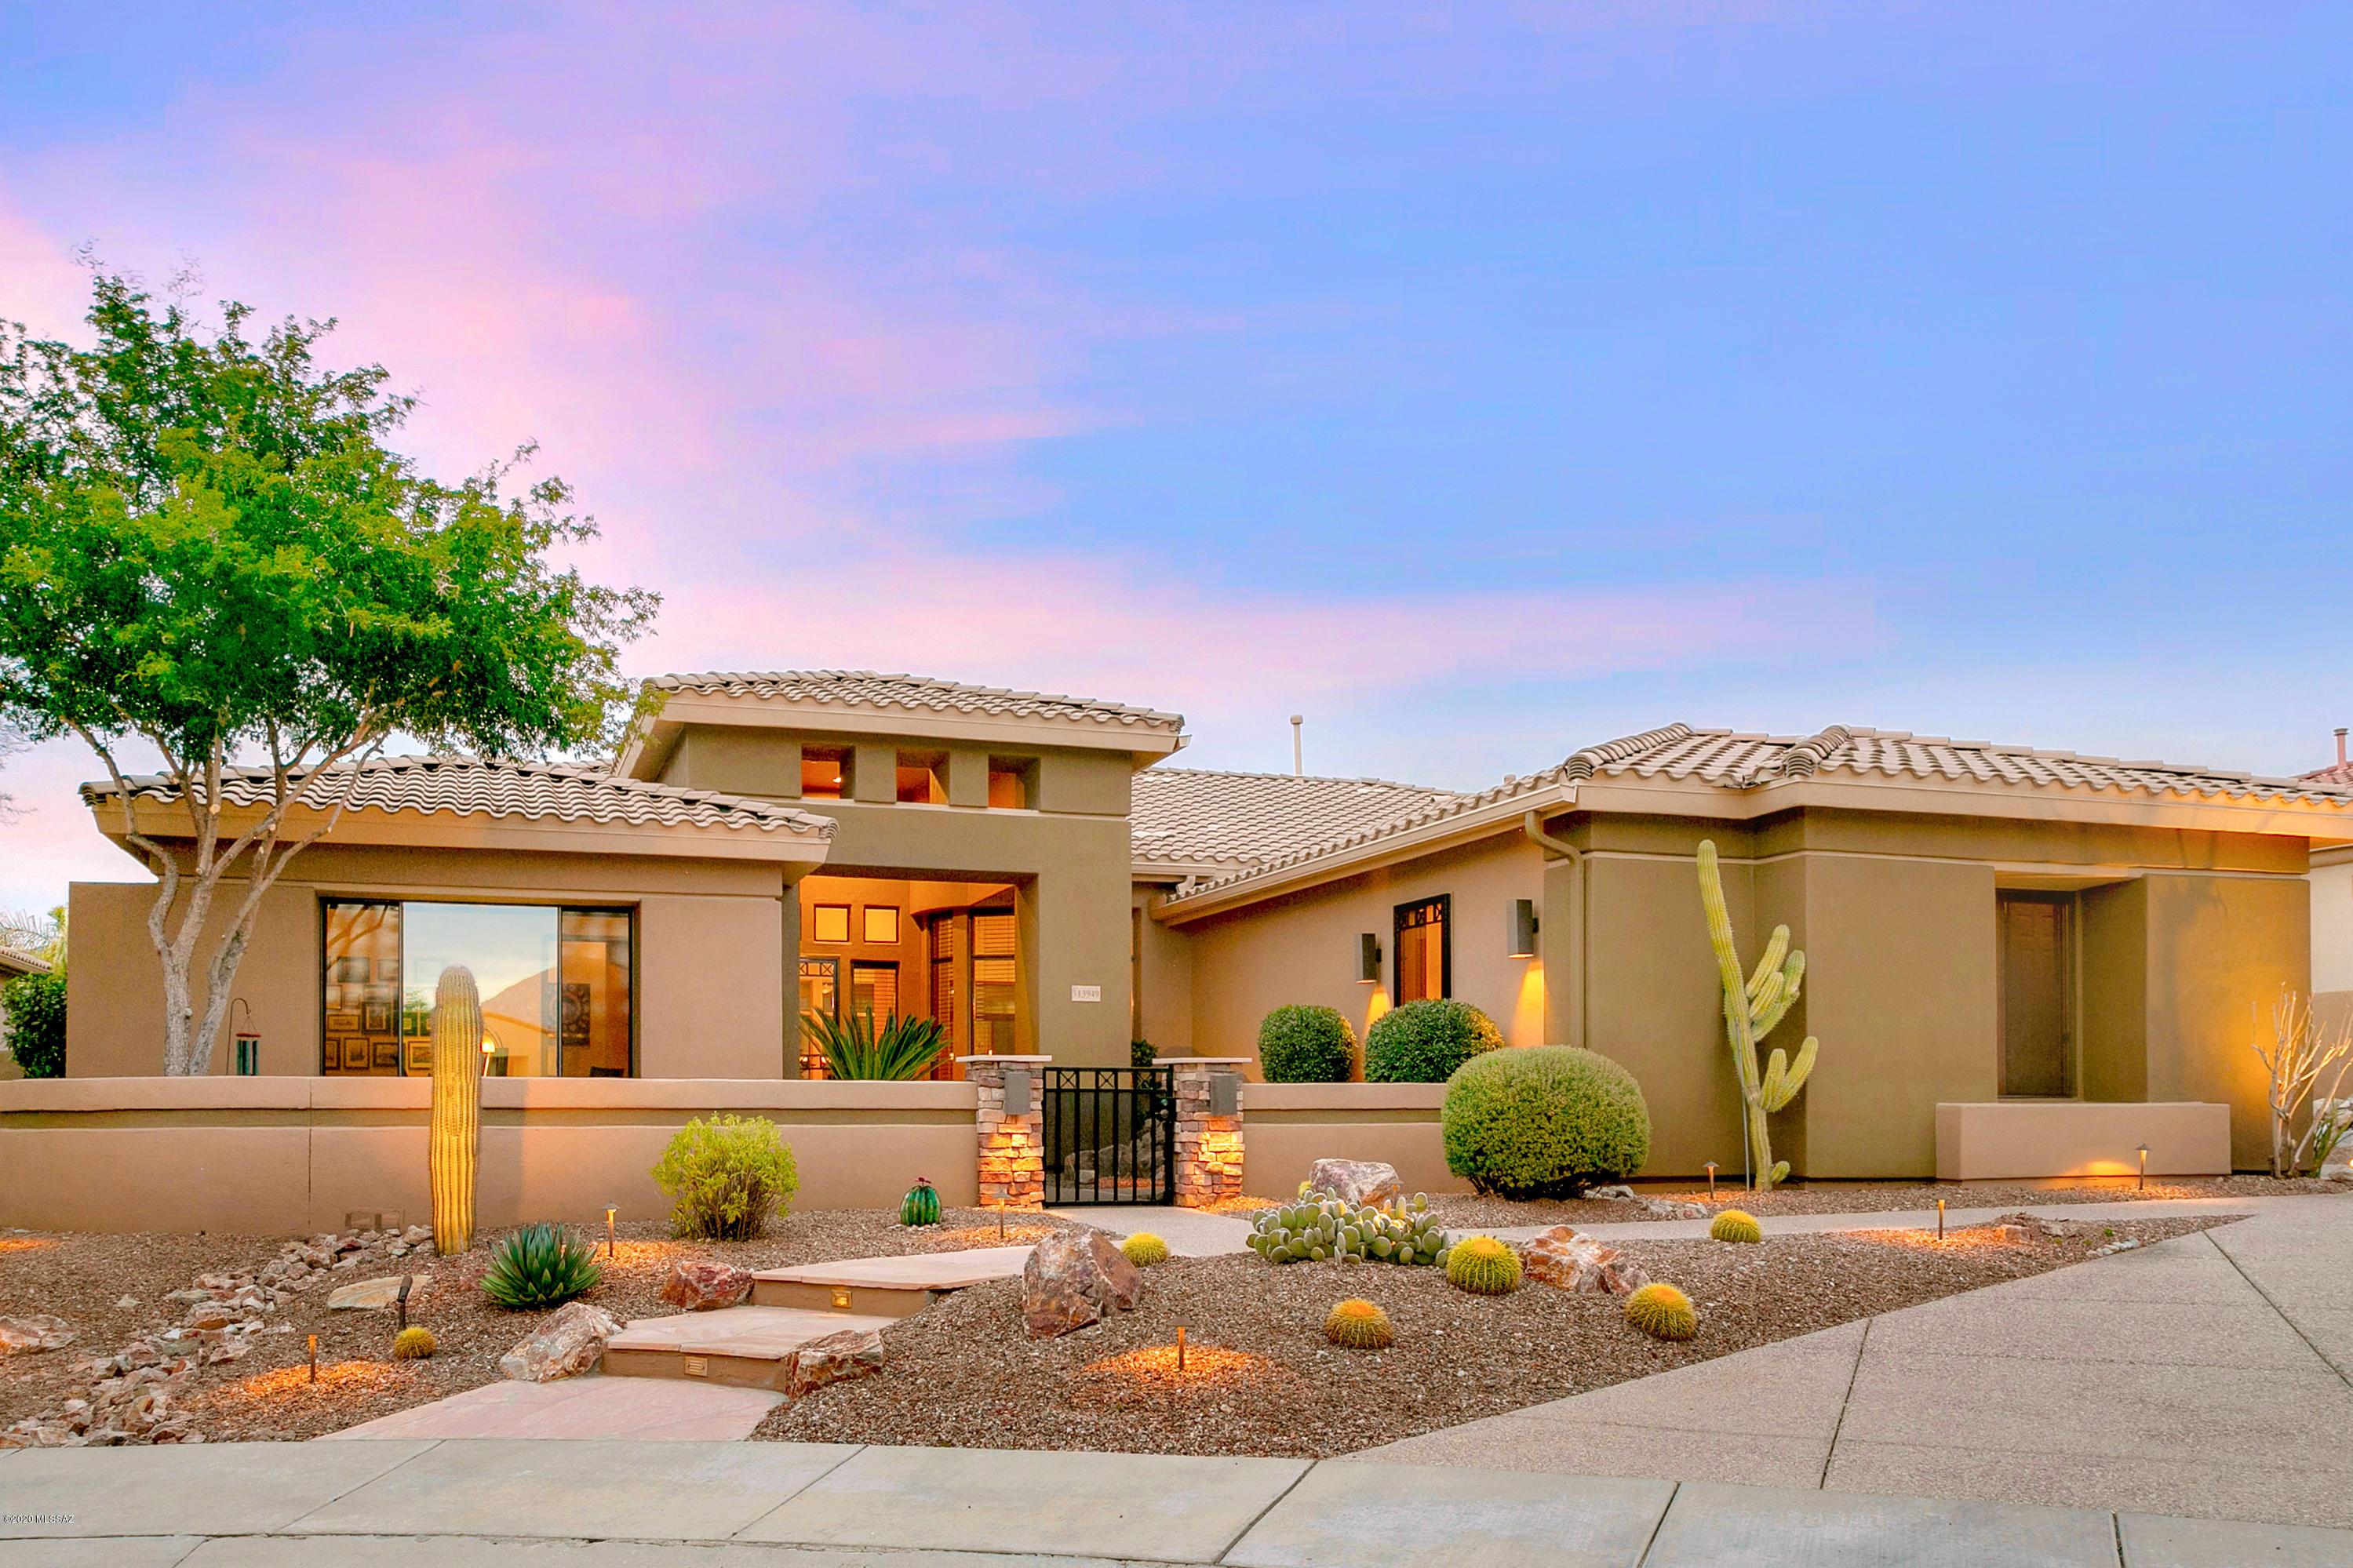 Photo of 13949 Steprock Canyon Place, Oro Valley, AZ 85755